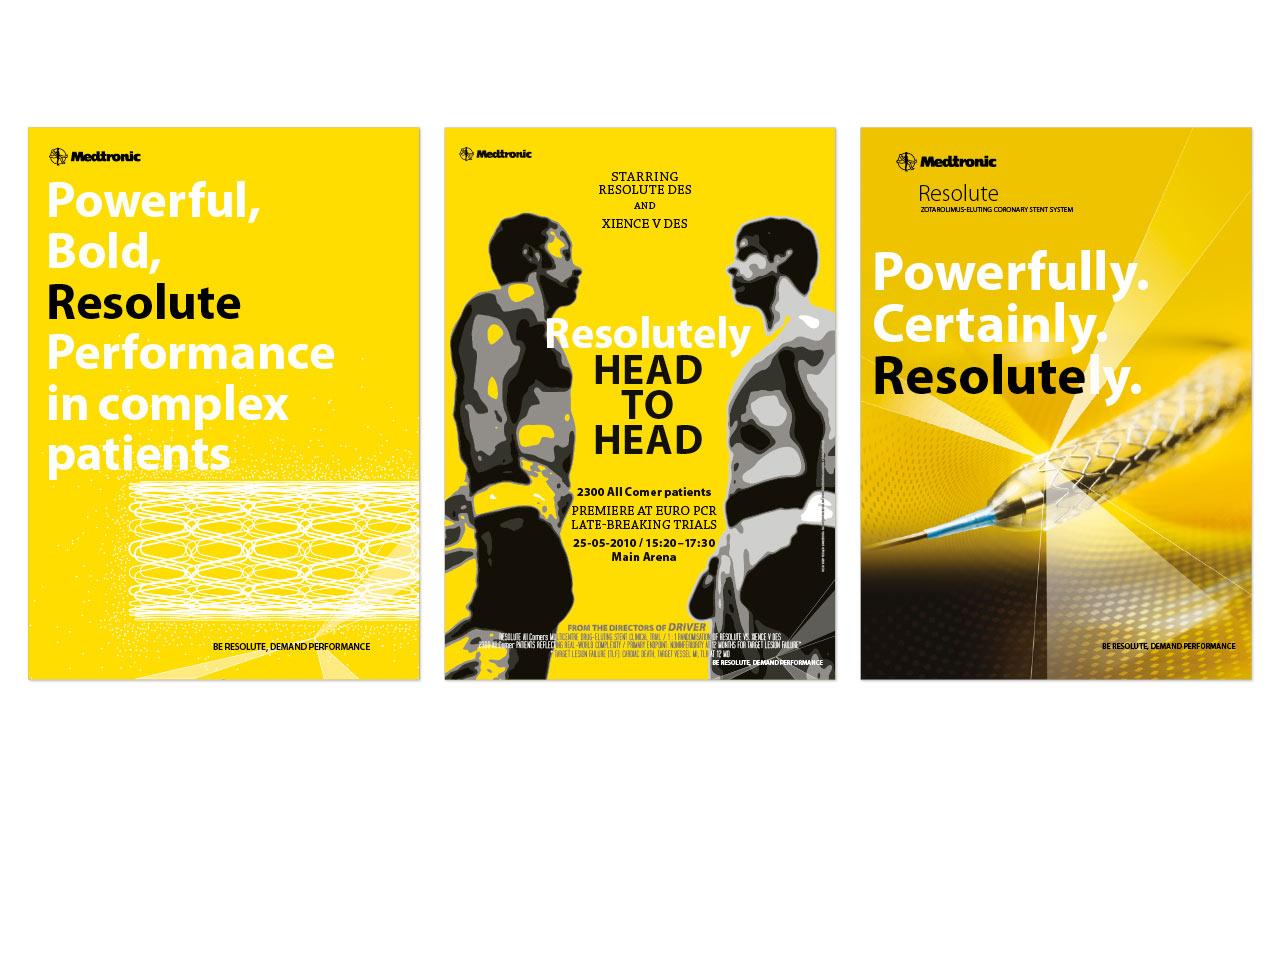 Medtronic Resolute campagne - design: ontwerpbureau VA